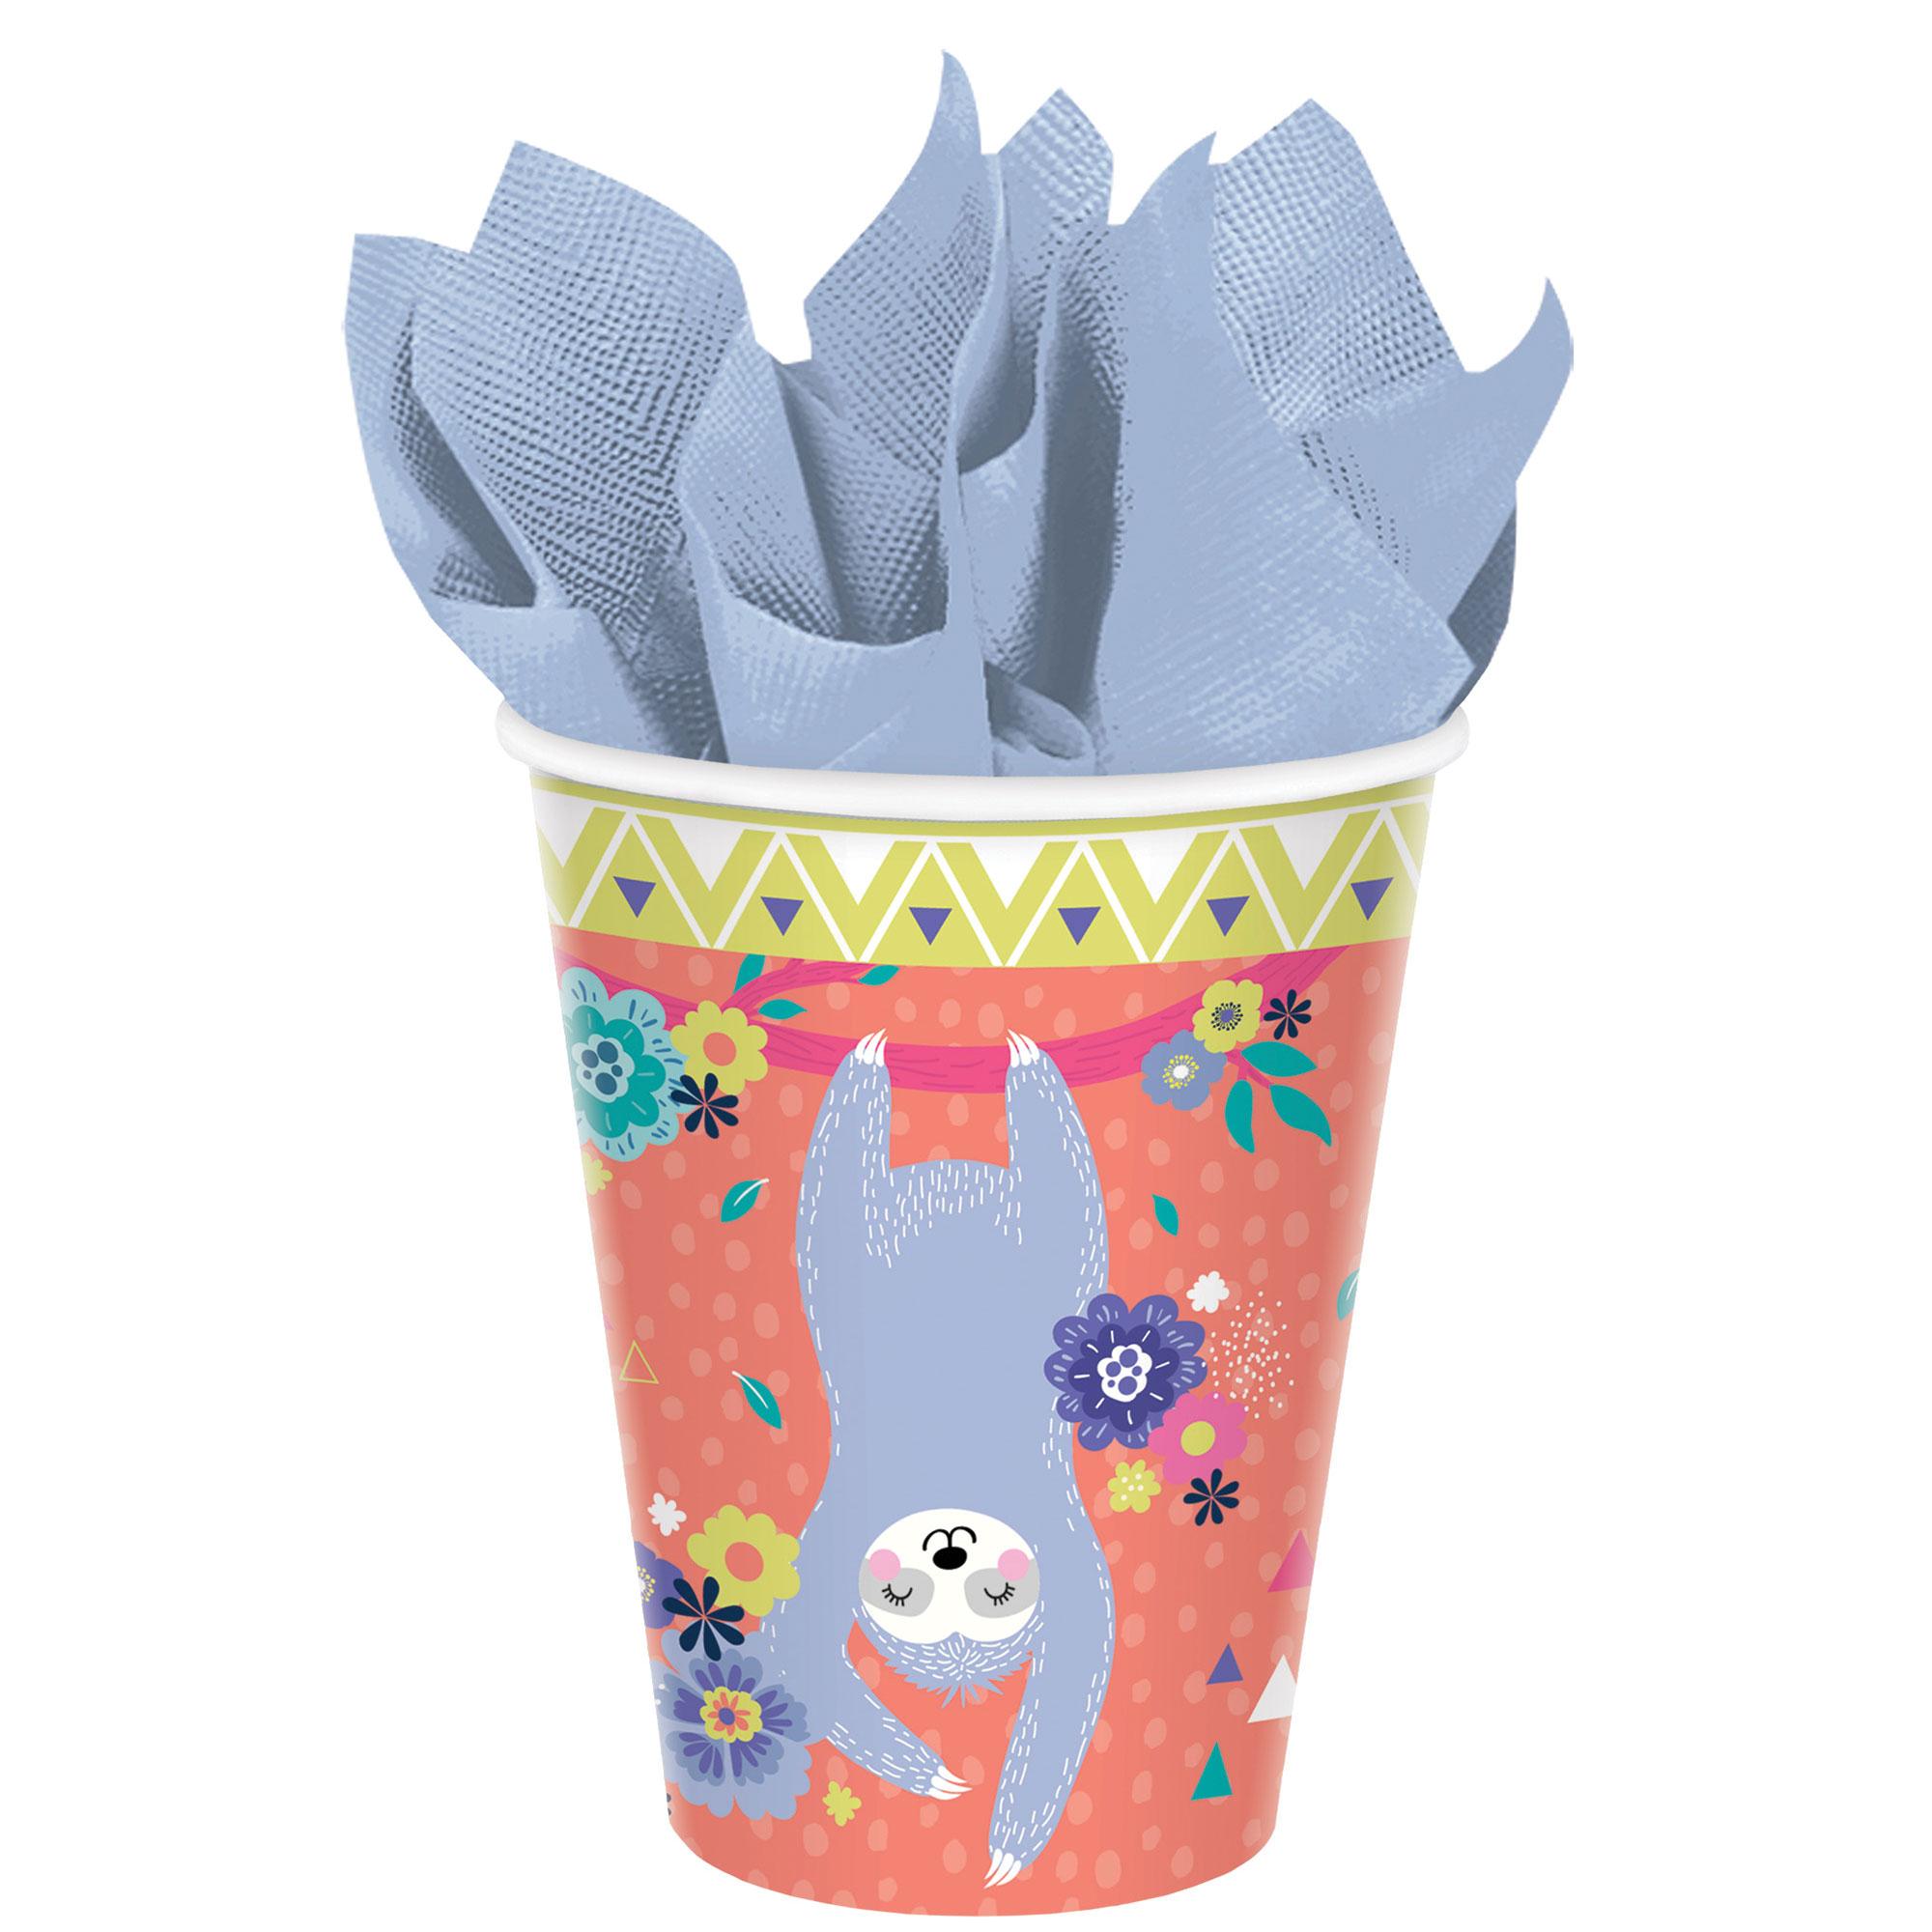 Sloth 9oz / 266ml Paper Cups